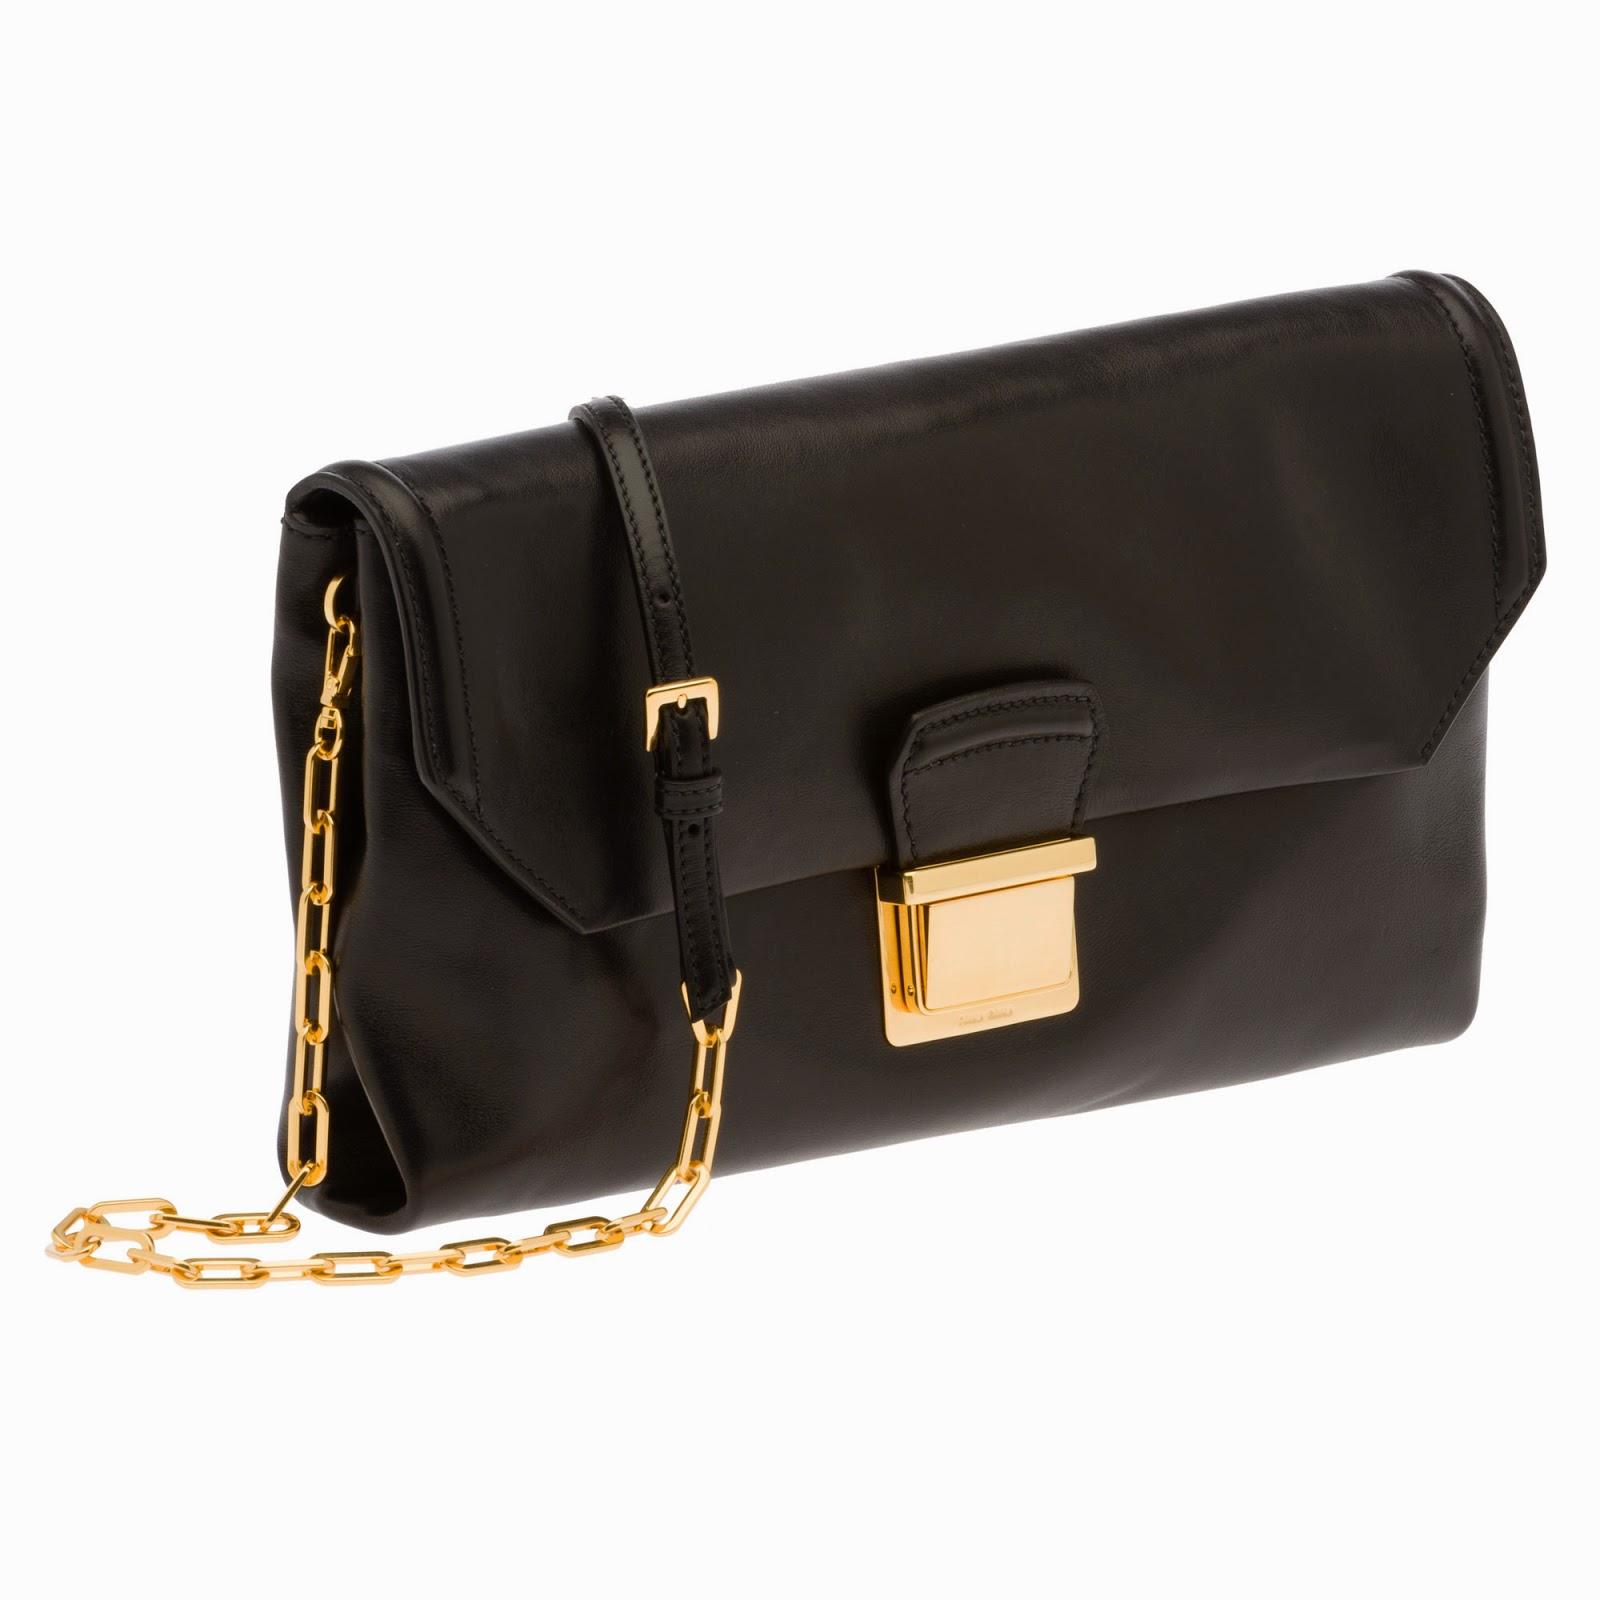 siyah+omuz+%25C3%25A7antas%25C4%25B1 Miu Miu Herbst Winter 2014 Handtaschen Modelle